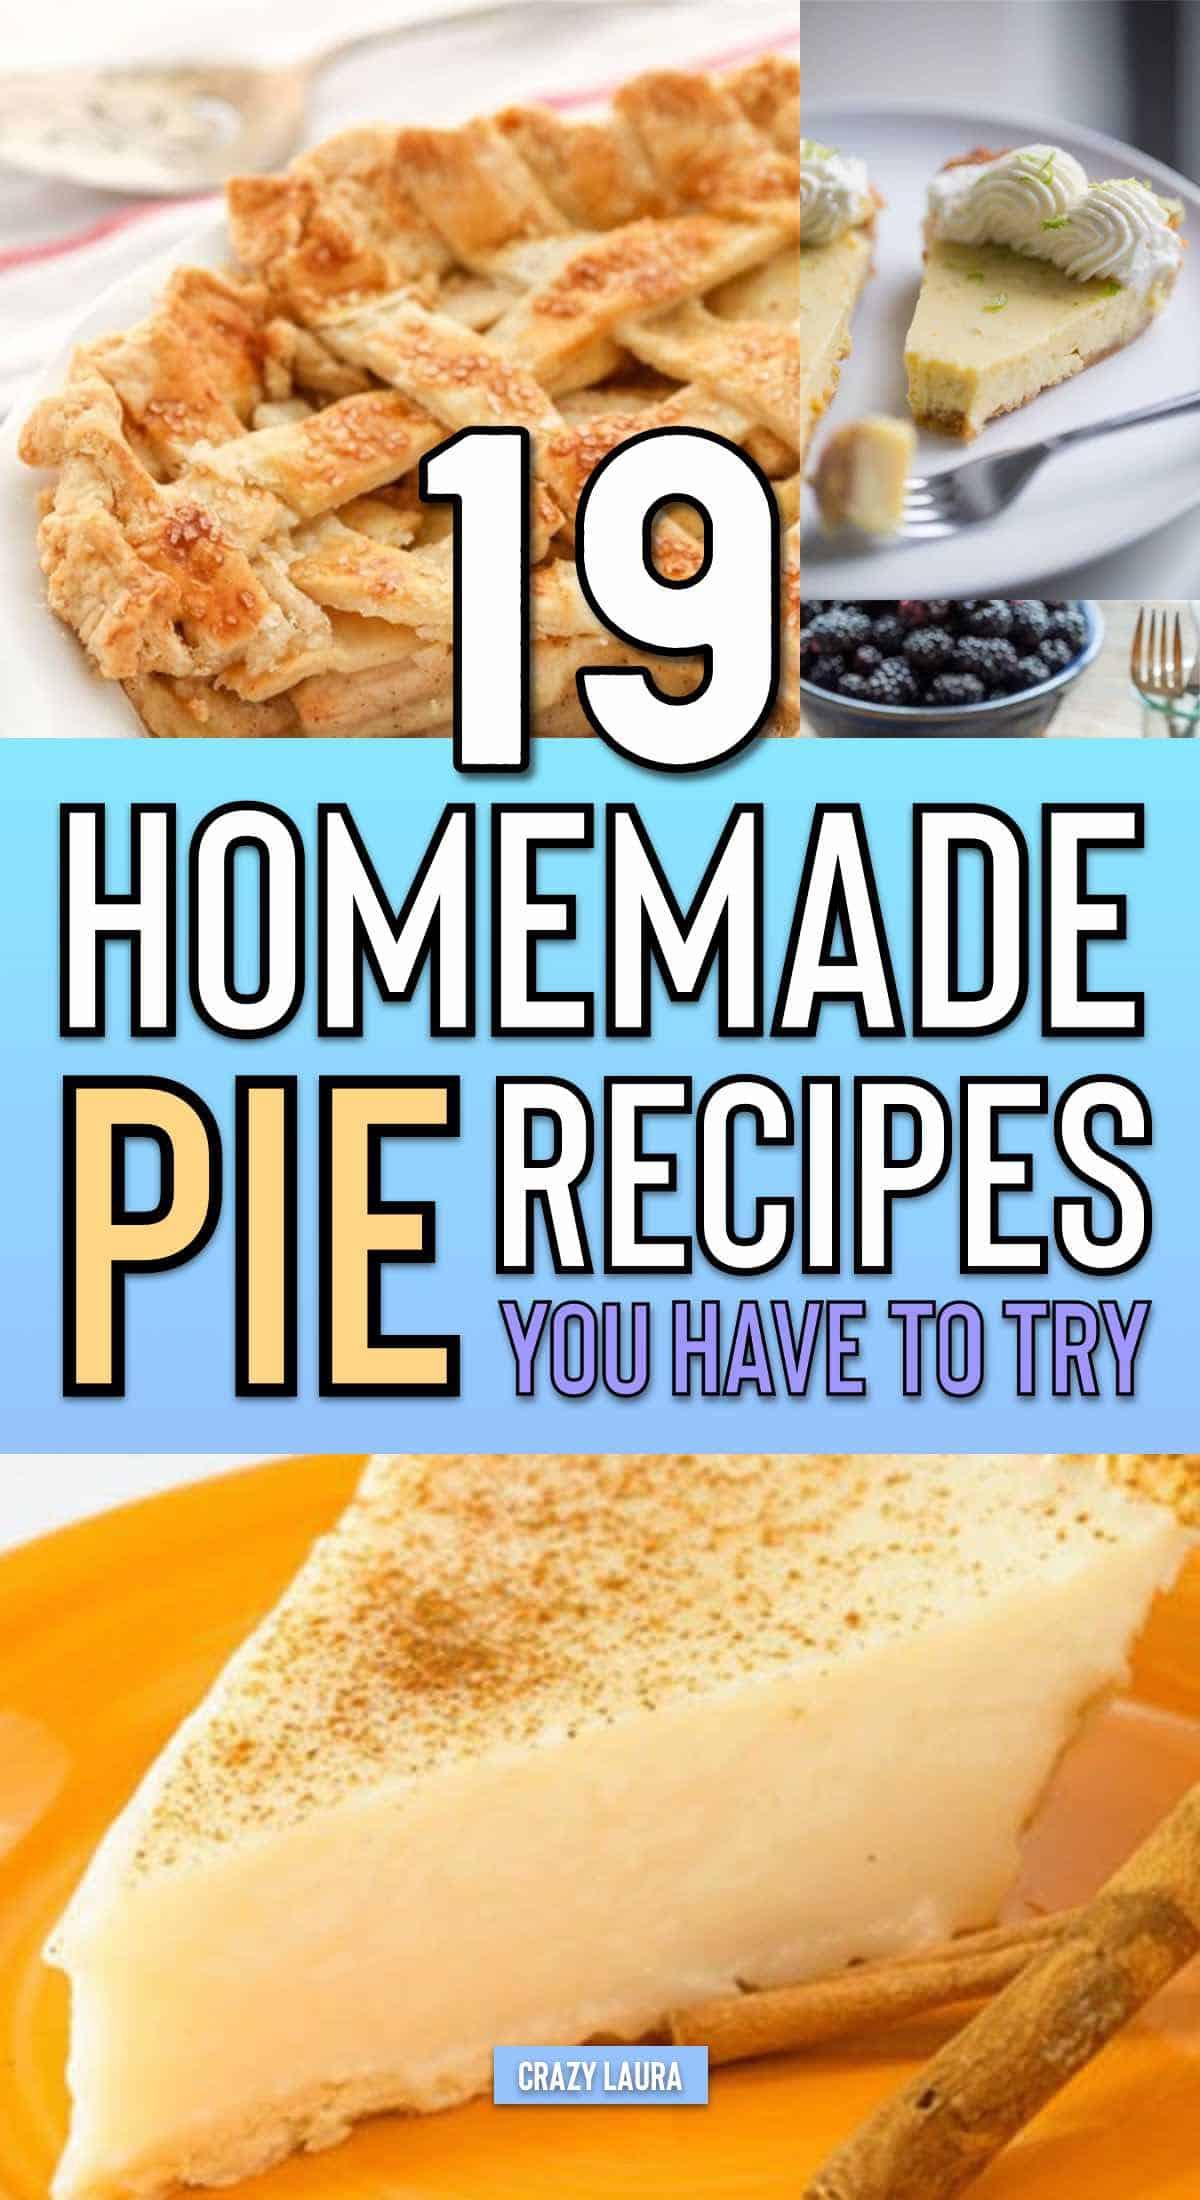 list of pie recipes